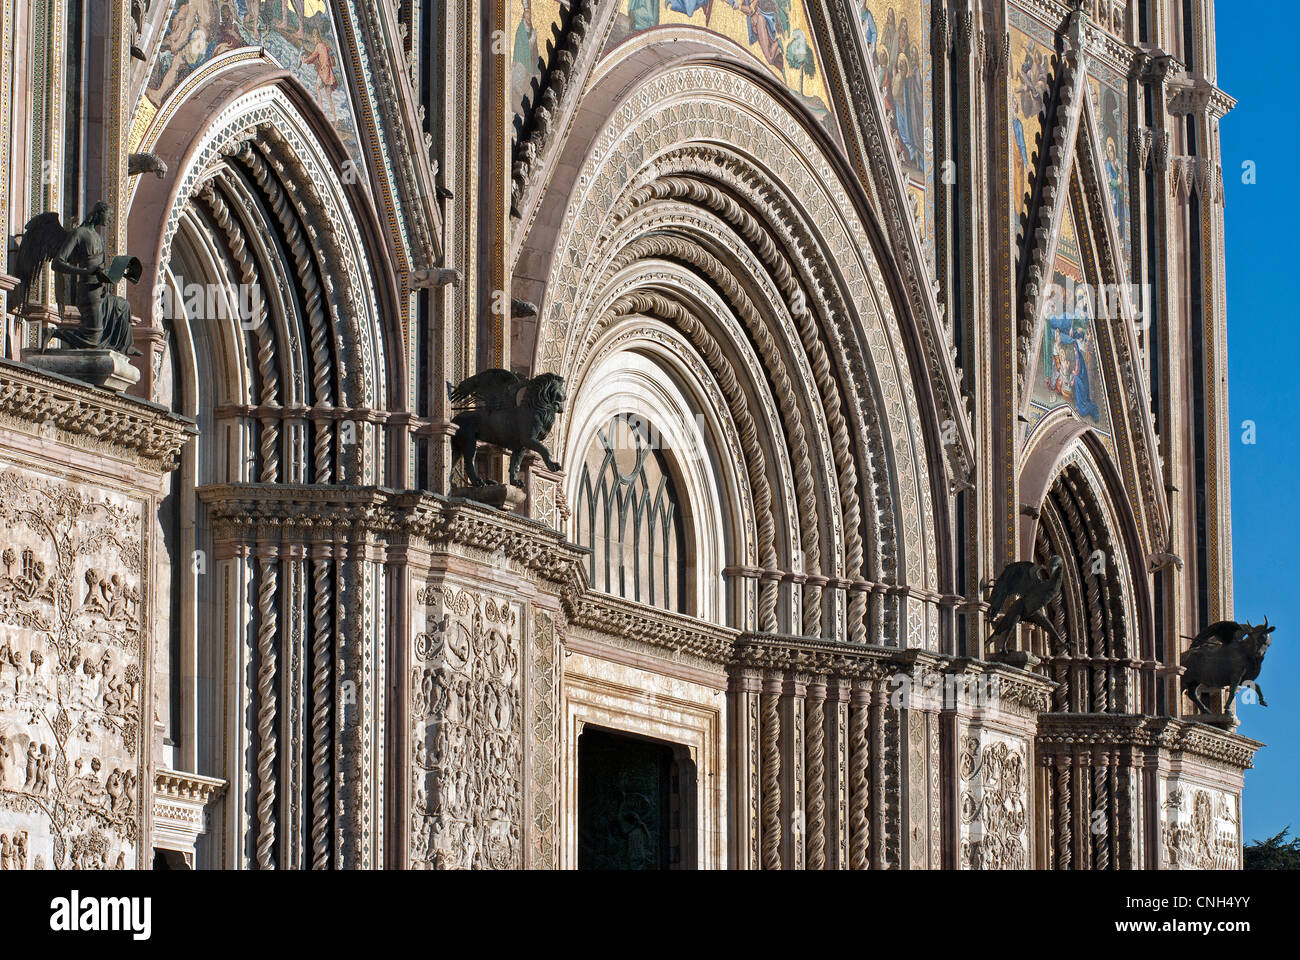 Orvieto Cathedral. Detail of facade. Orvieto. Terni Province. Umbria. Italy - Stock Image